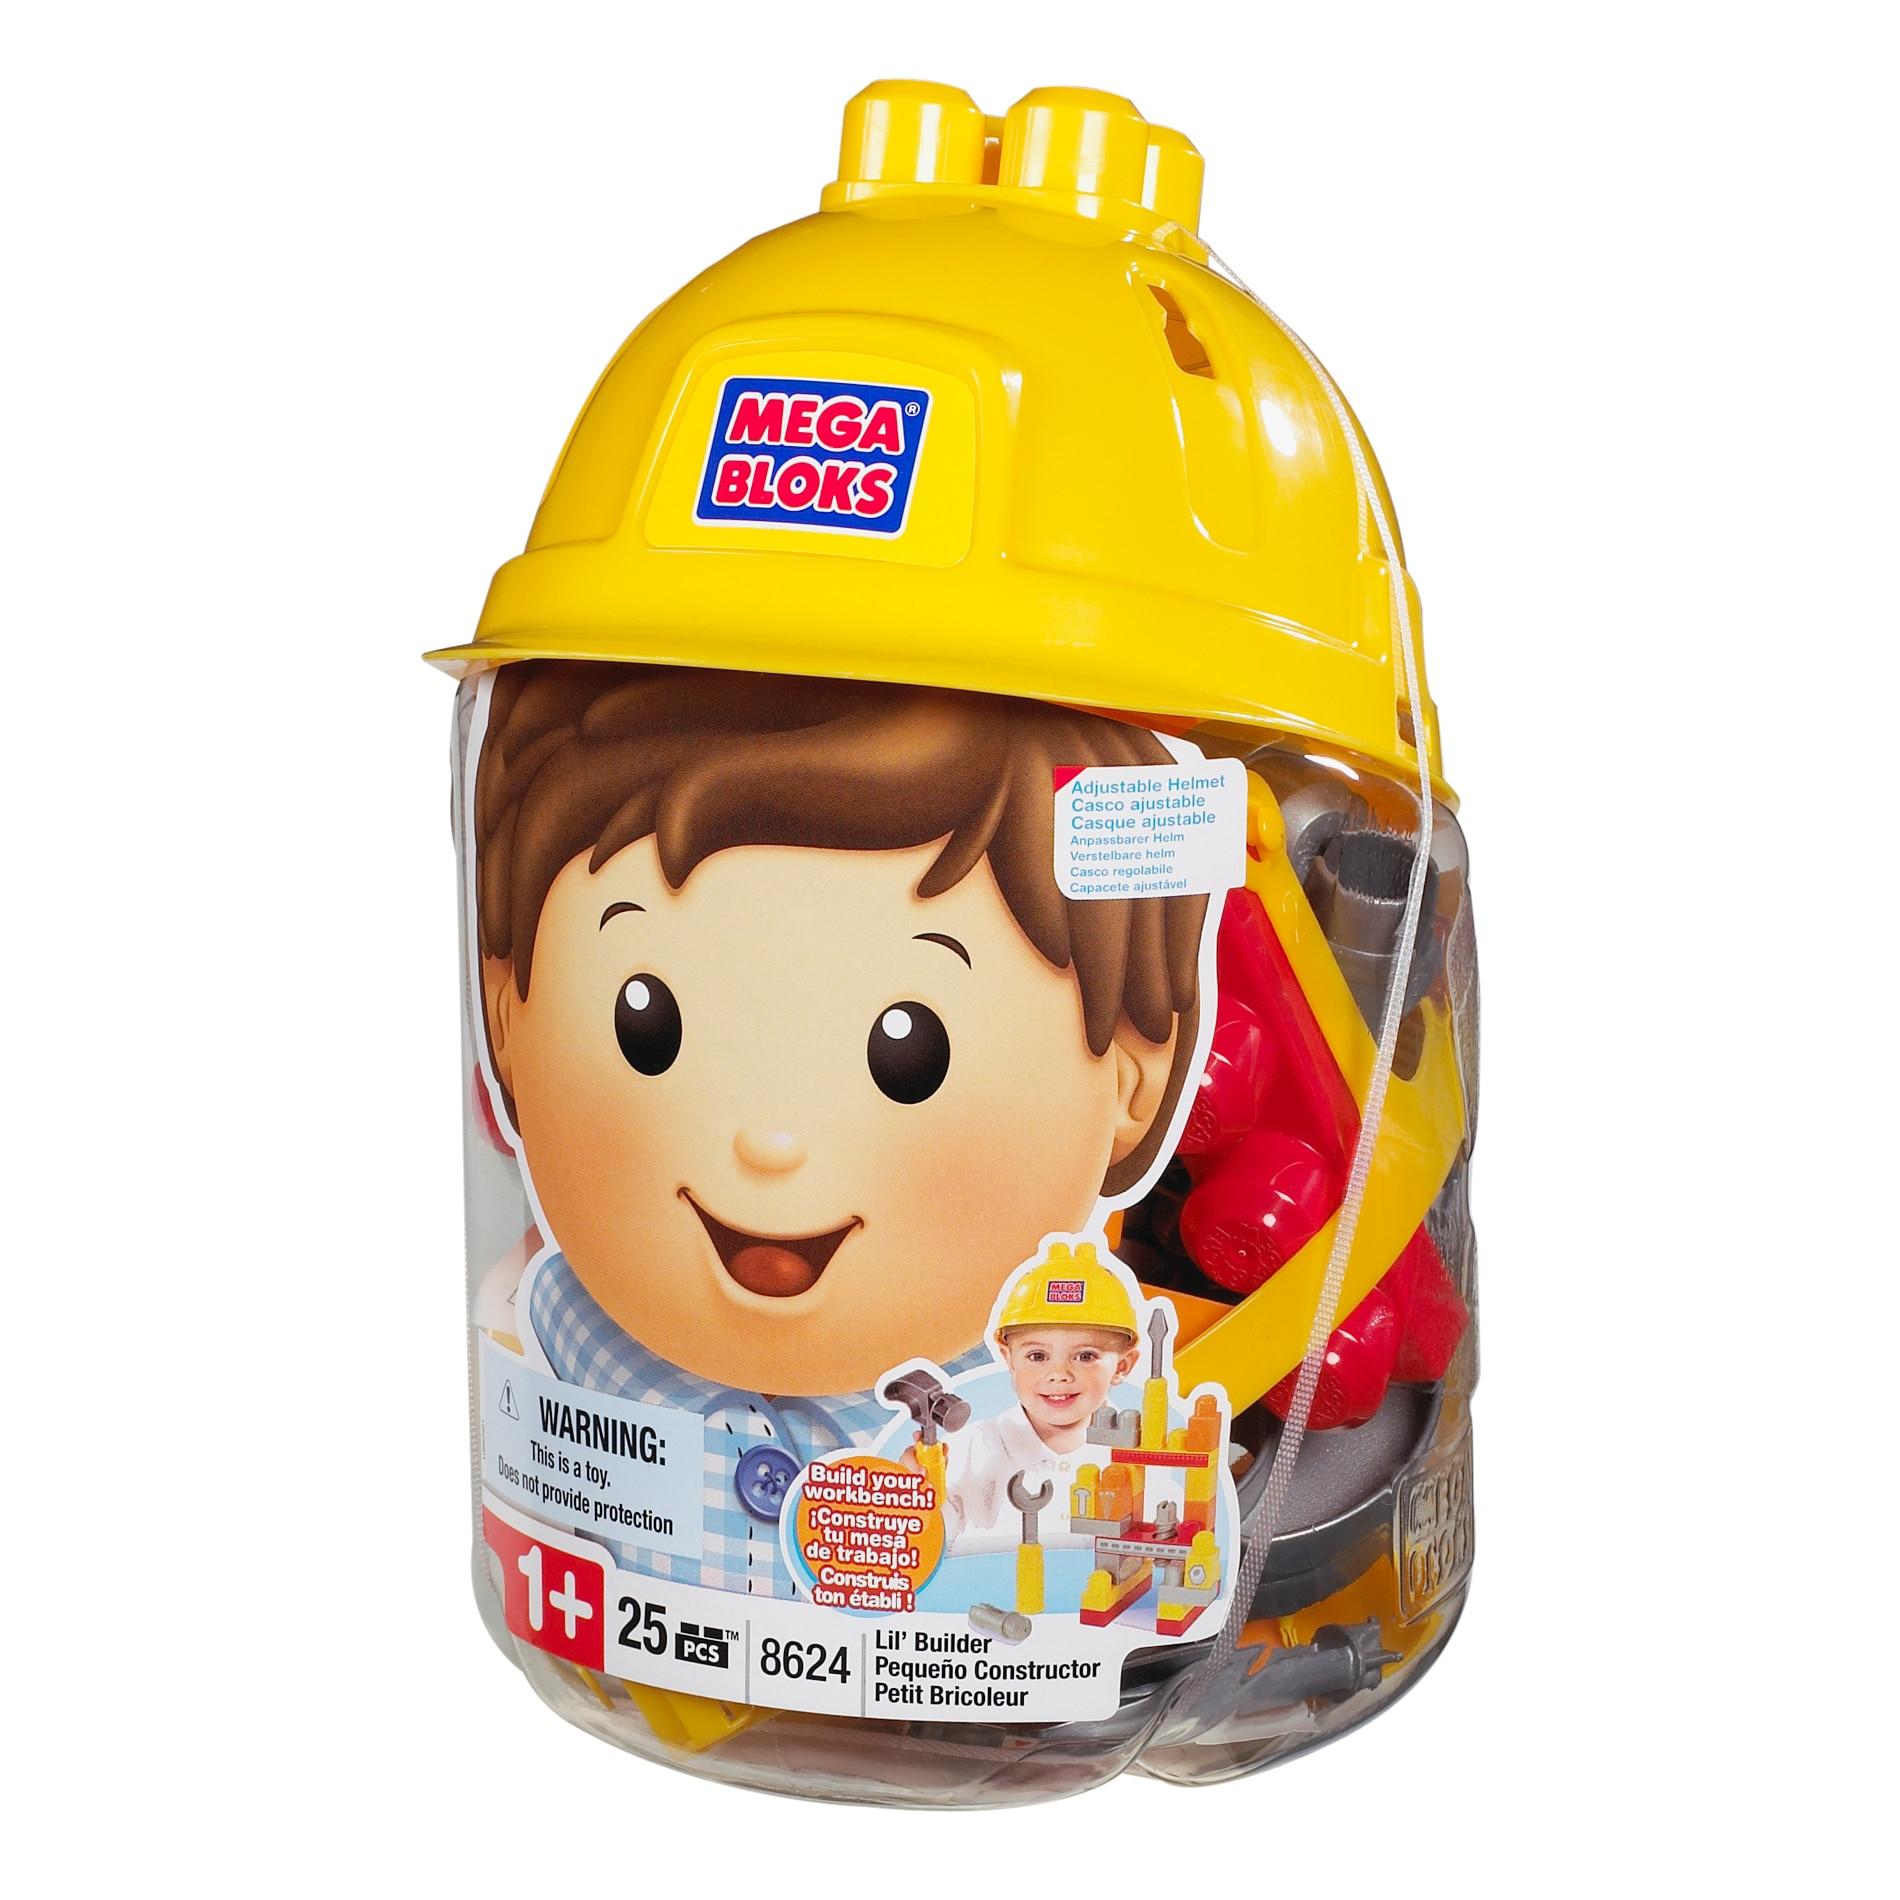 Mega Bloks Lil' Builder Hat Bucket Play Set